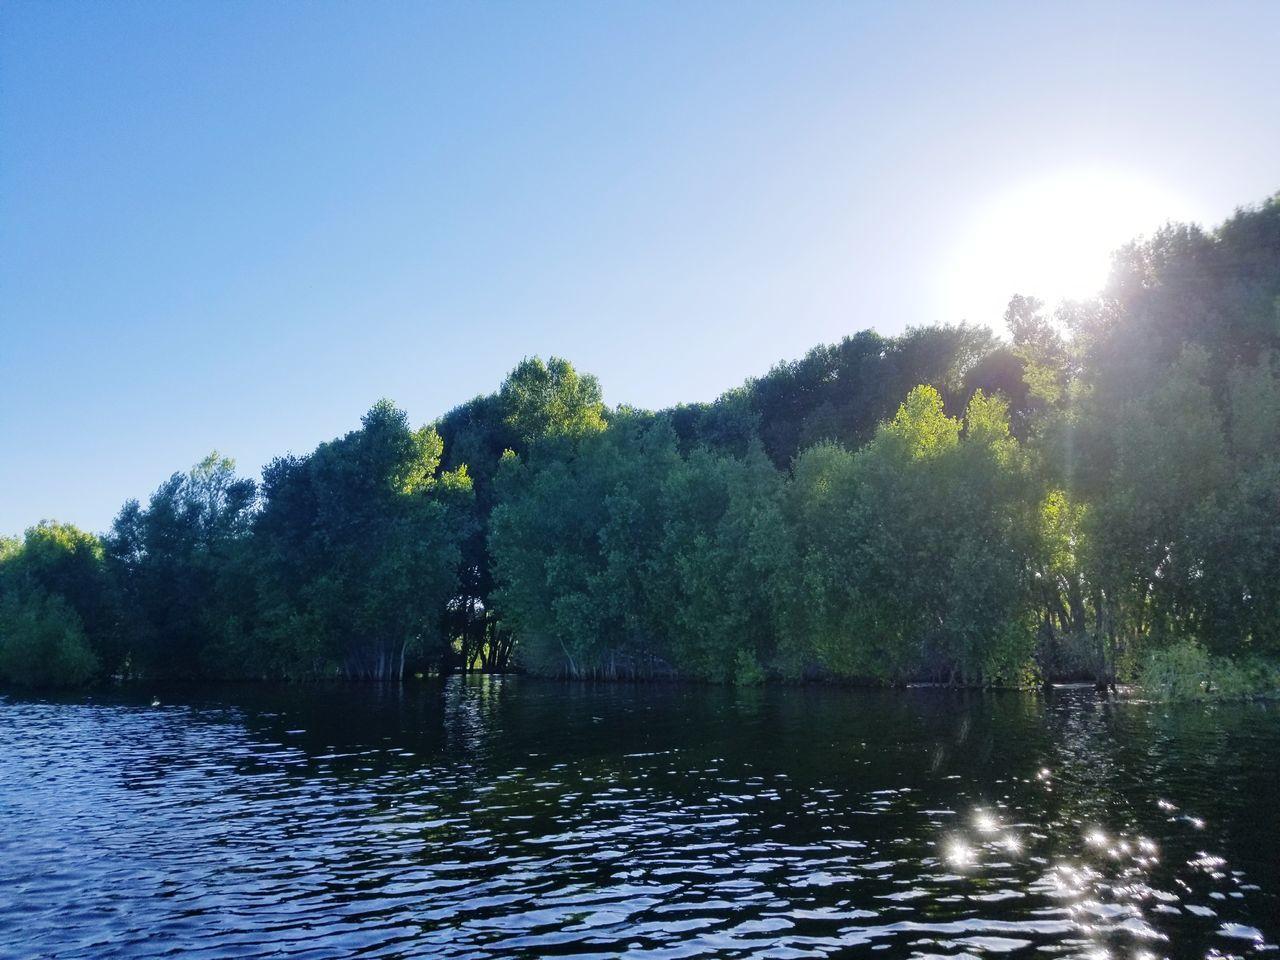 Kayaking Water Trees Outdoors Lake Day No People Having A Good Time Exercising In Nature Fun